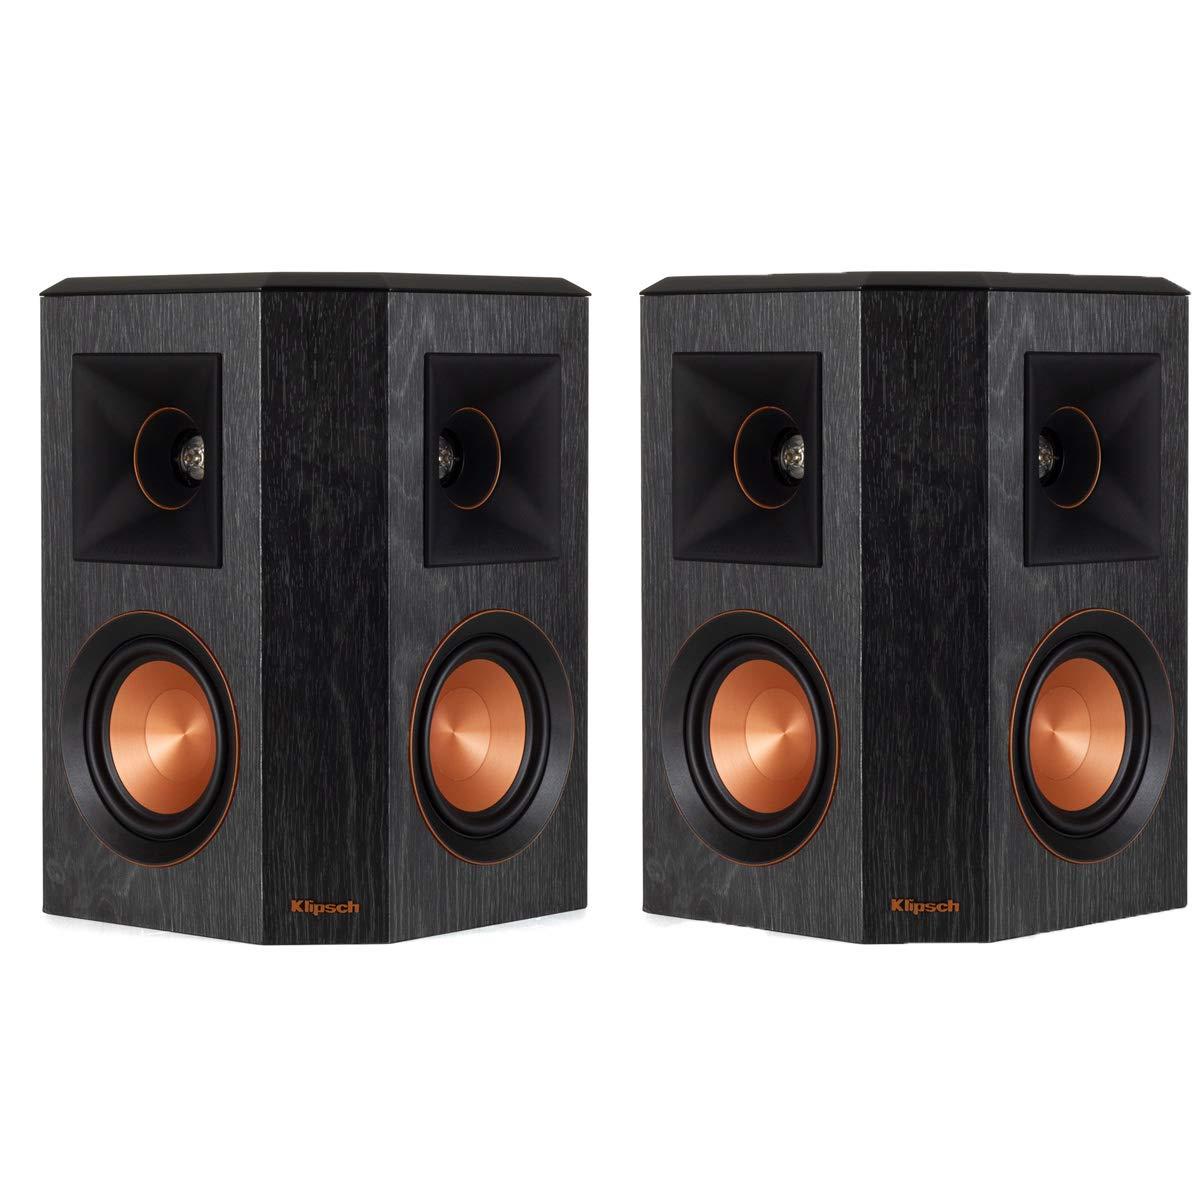 Klipsch RP-402S Reference Premiere Surround Speakers - Pair (Ebony)